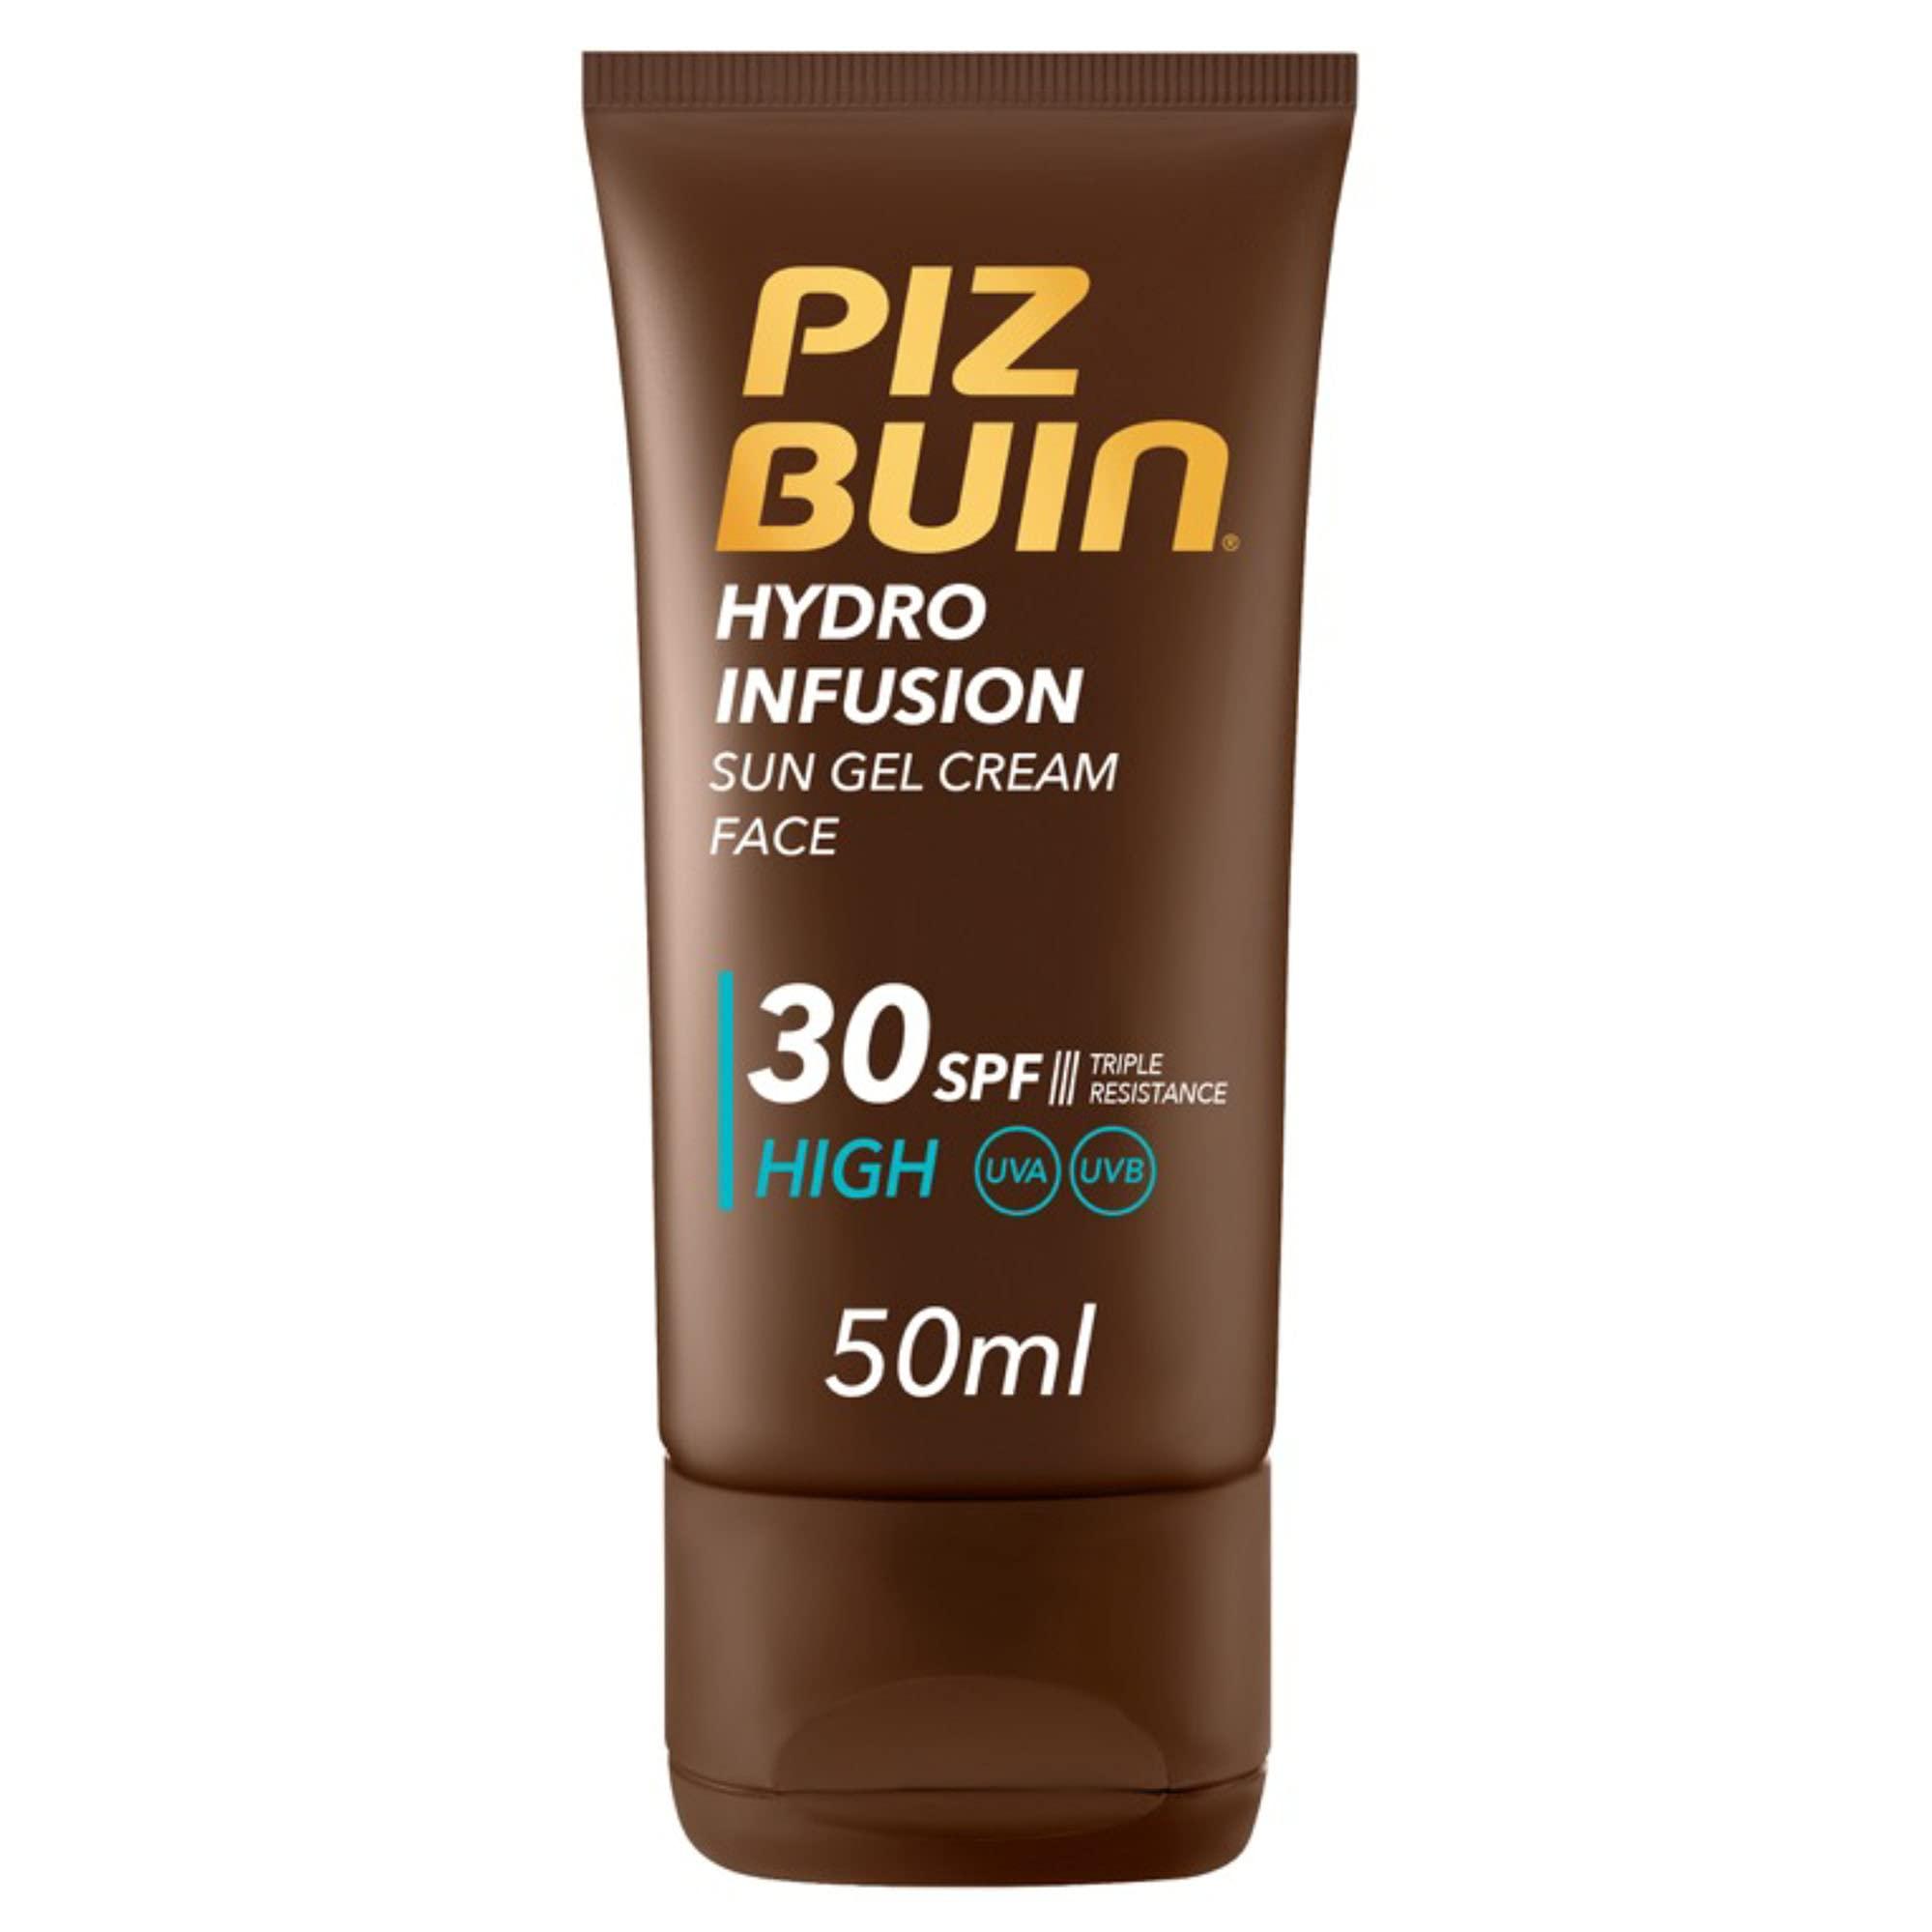 Piz Buin, Protección Solar Facial en Gel, Hydro Infusion SPF 30 Protección Alta, 50 ml